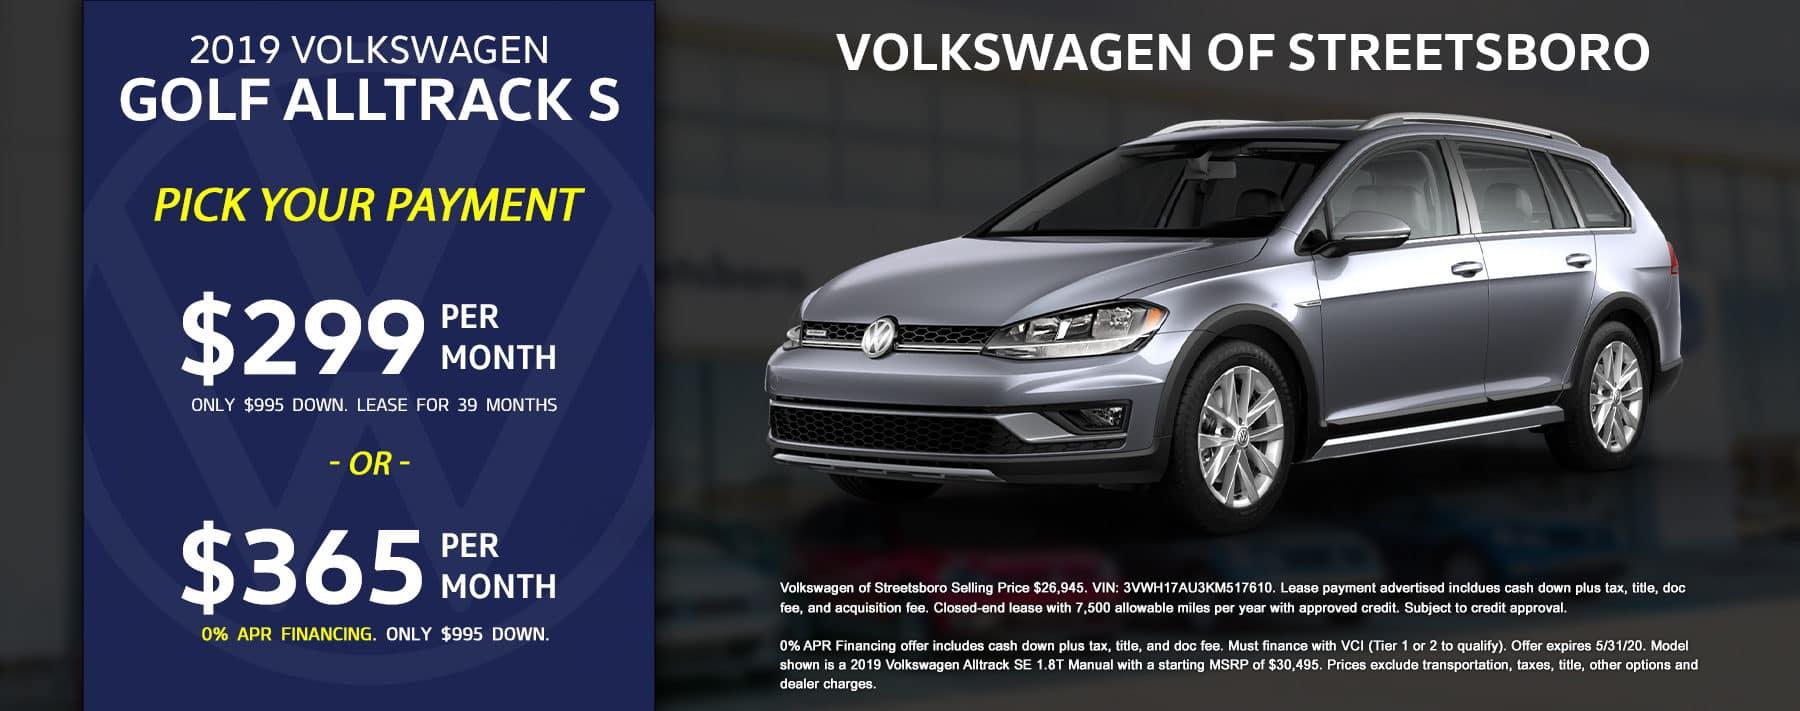 2019 VW Alltrack - May 2020